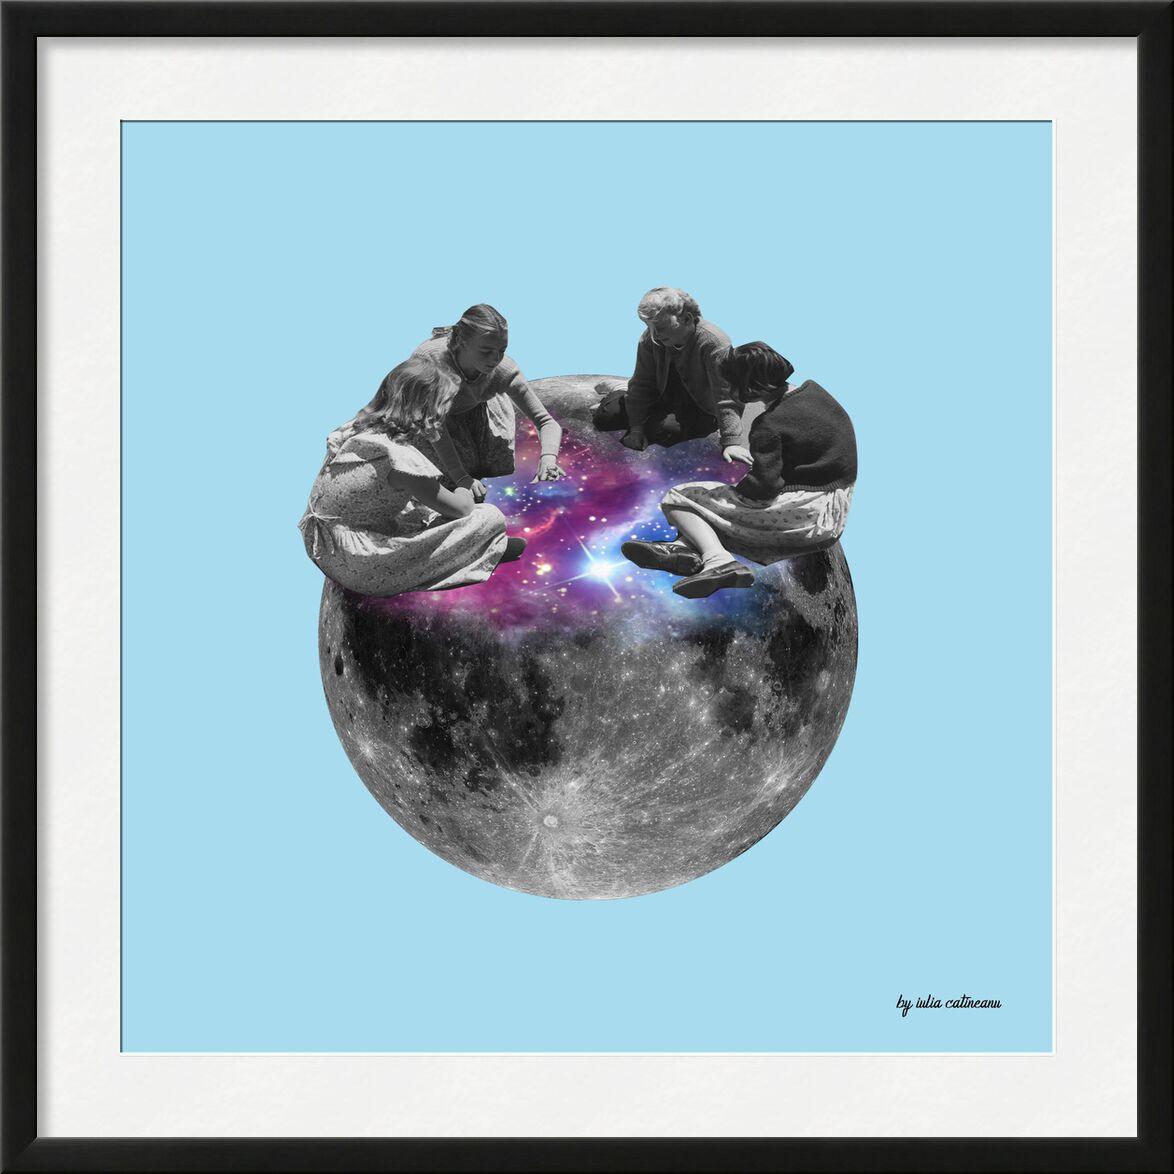 On the moon de IULIA CATINEANU, Prodi Art, abstrait, lune, art, pop Art, surrealisme, univers